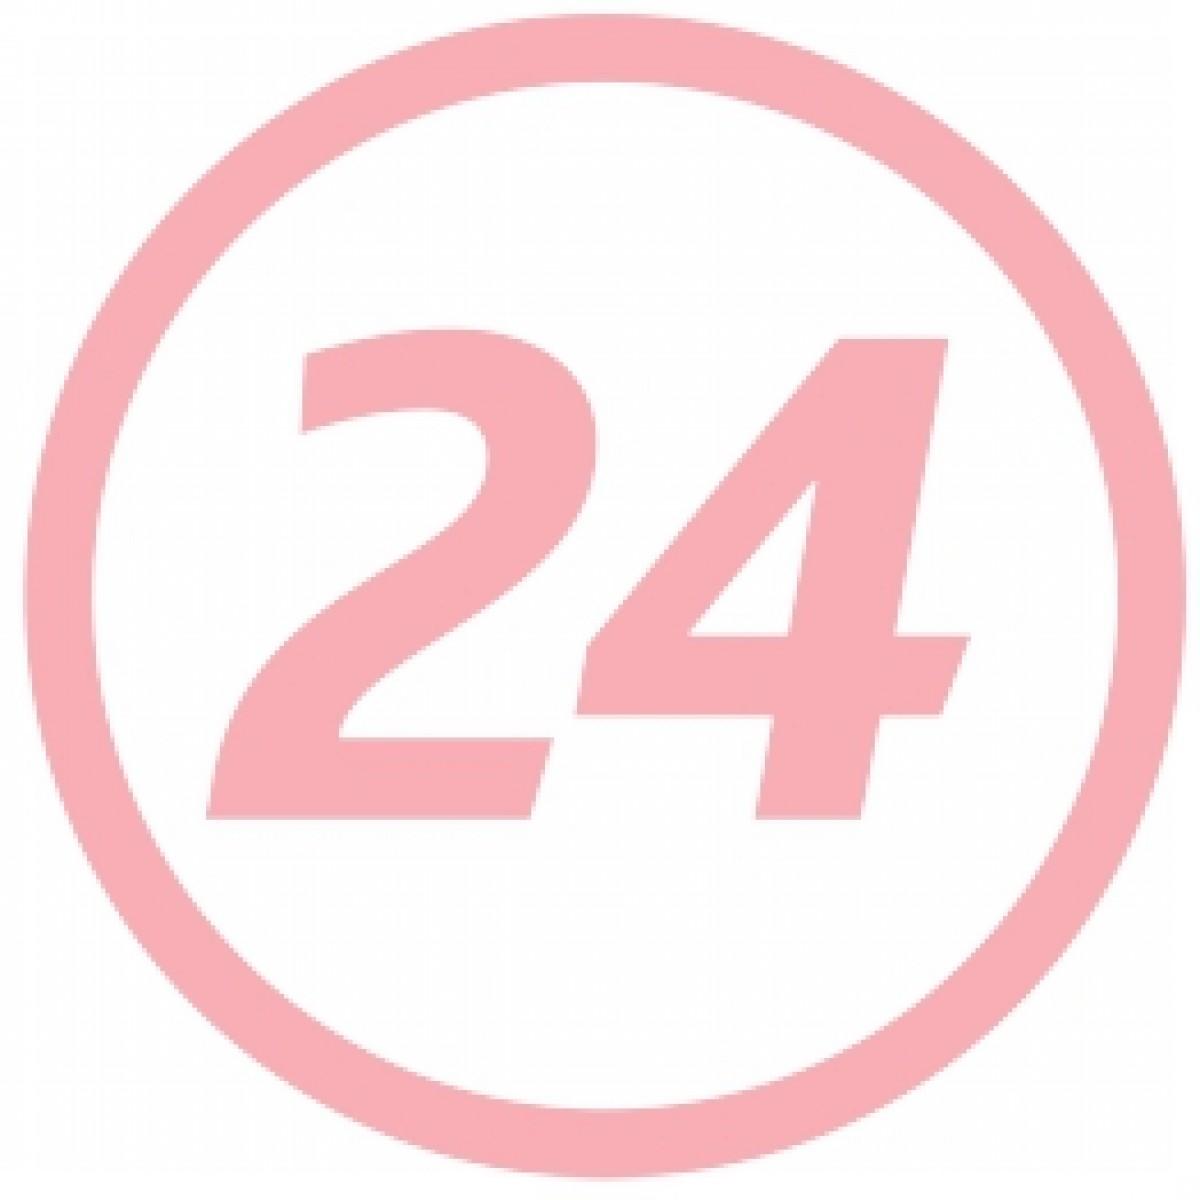 Fervex Pentru Copii Fara Zahar Pulbere, Plicuri, 8buc